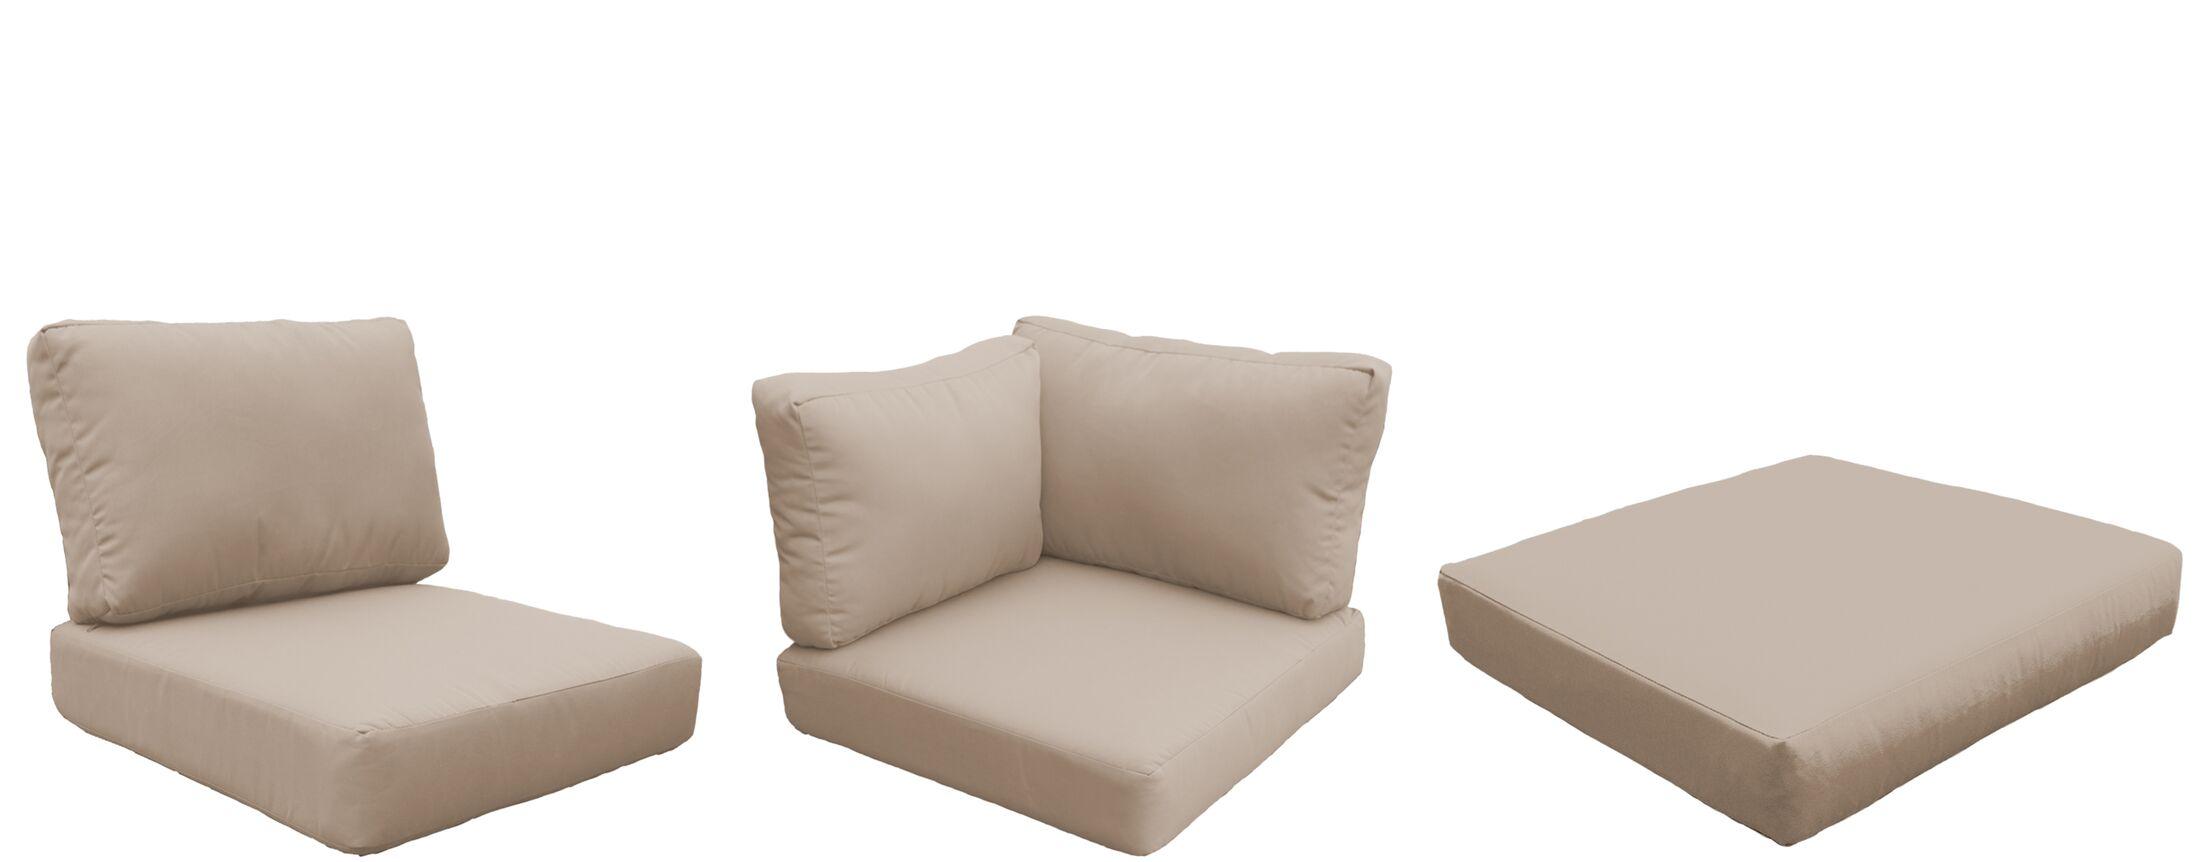 Florence 16 Piece Outdoor Cushion Set Fabric: Aruba